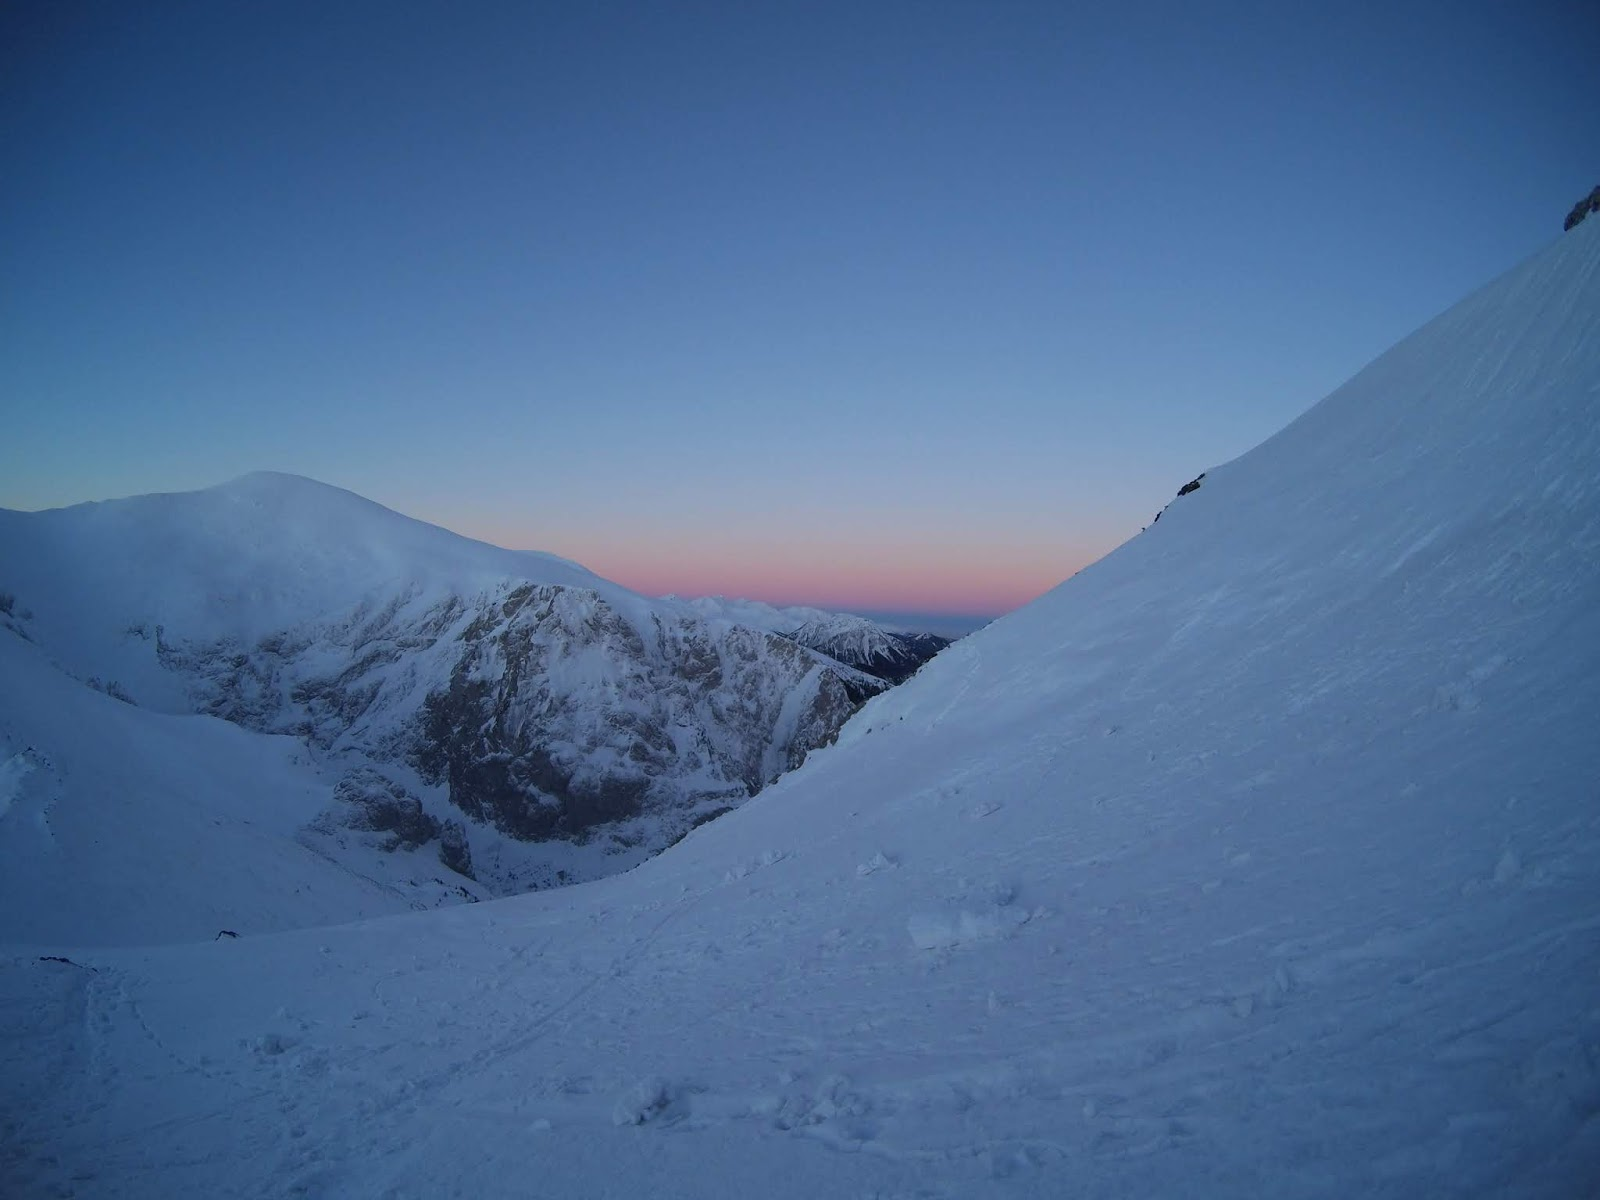 Giewont wschód słońca zimą